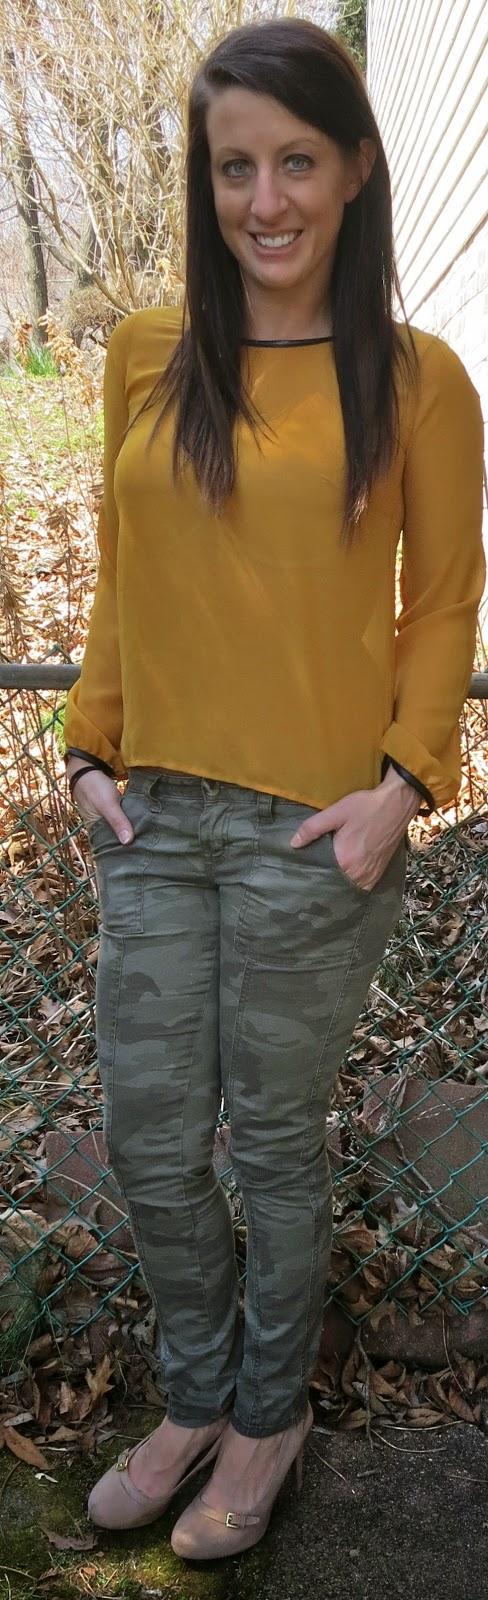 mustard shirt, camo pants, target, fashion, outfit